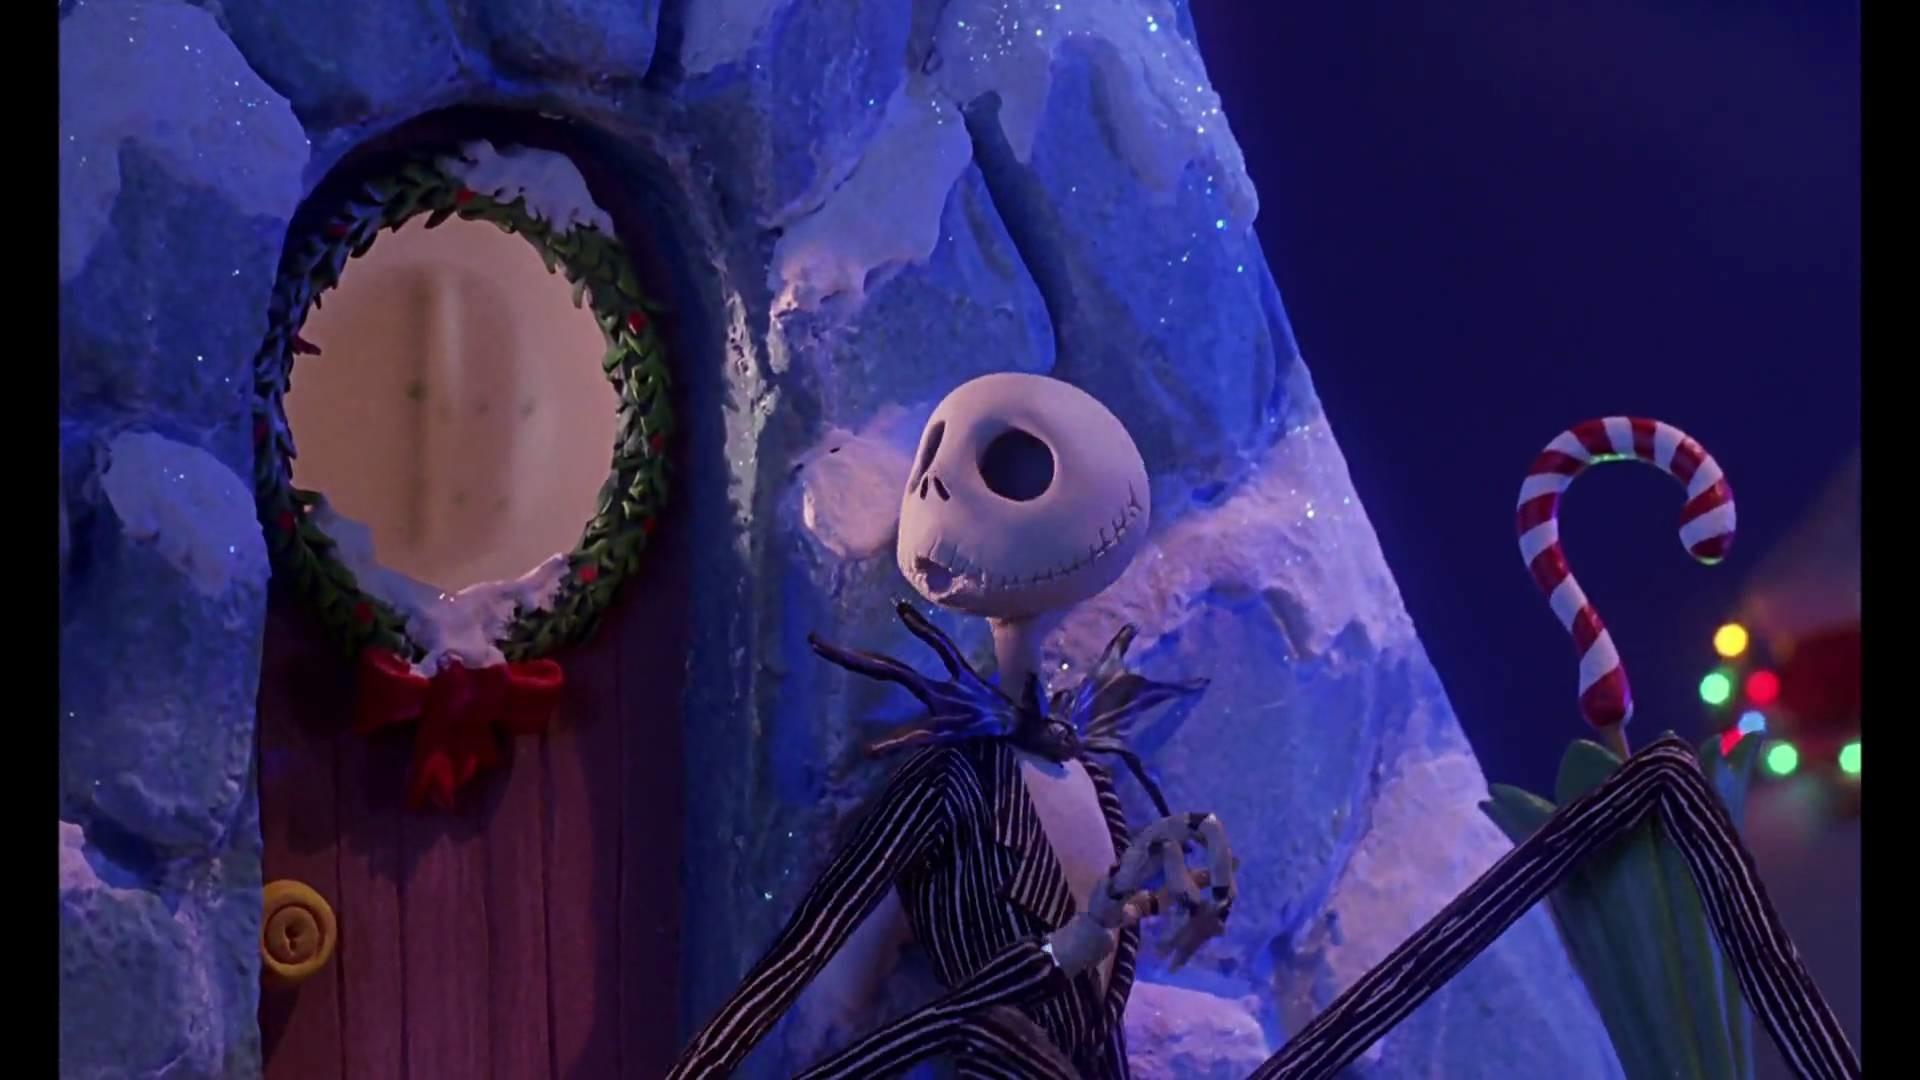 The Nightmare Before Christmas Movie Wallpapers | WallpapersIn4k.net